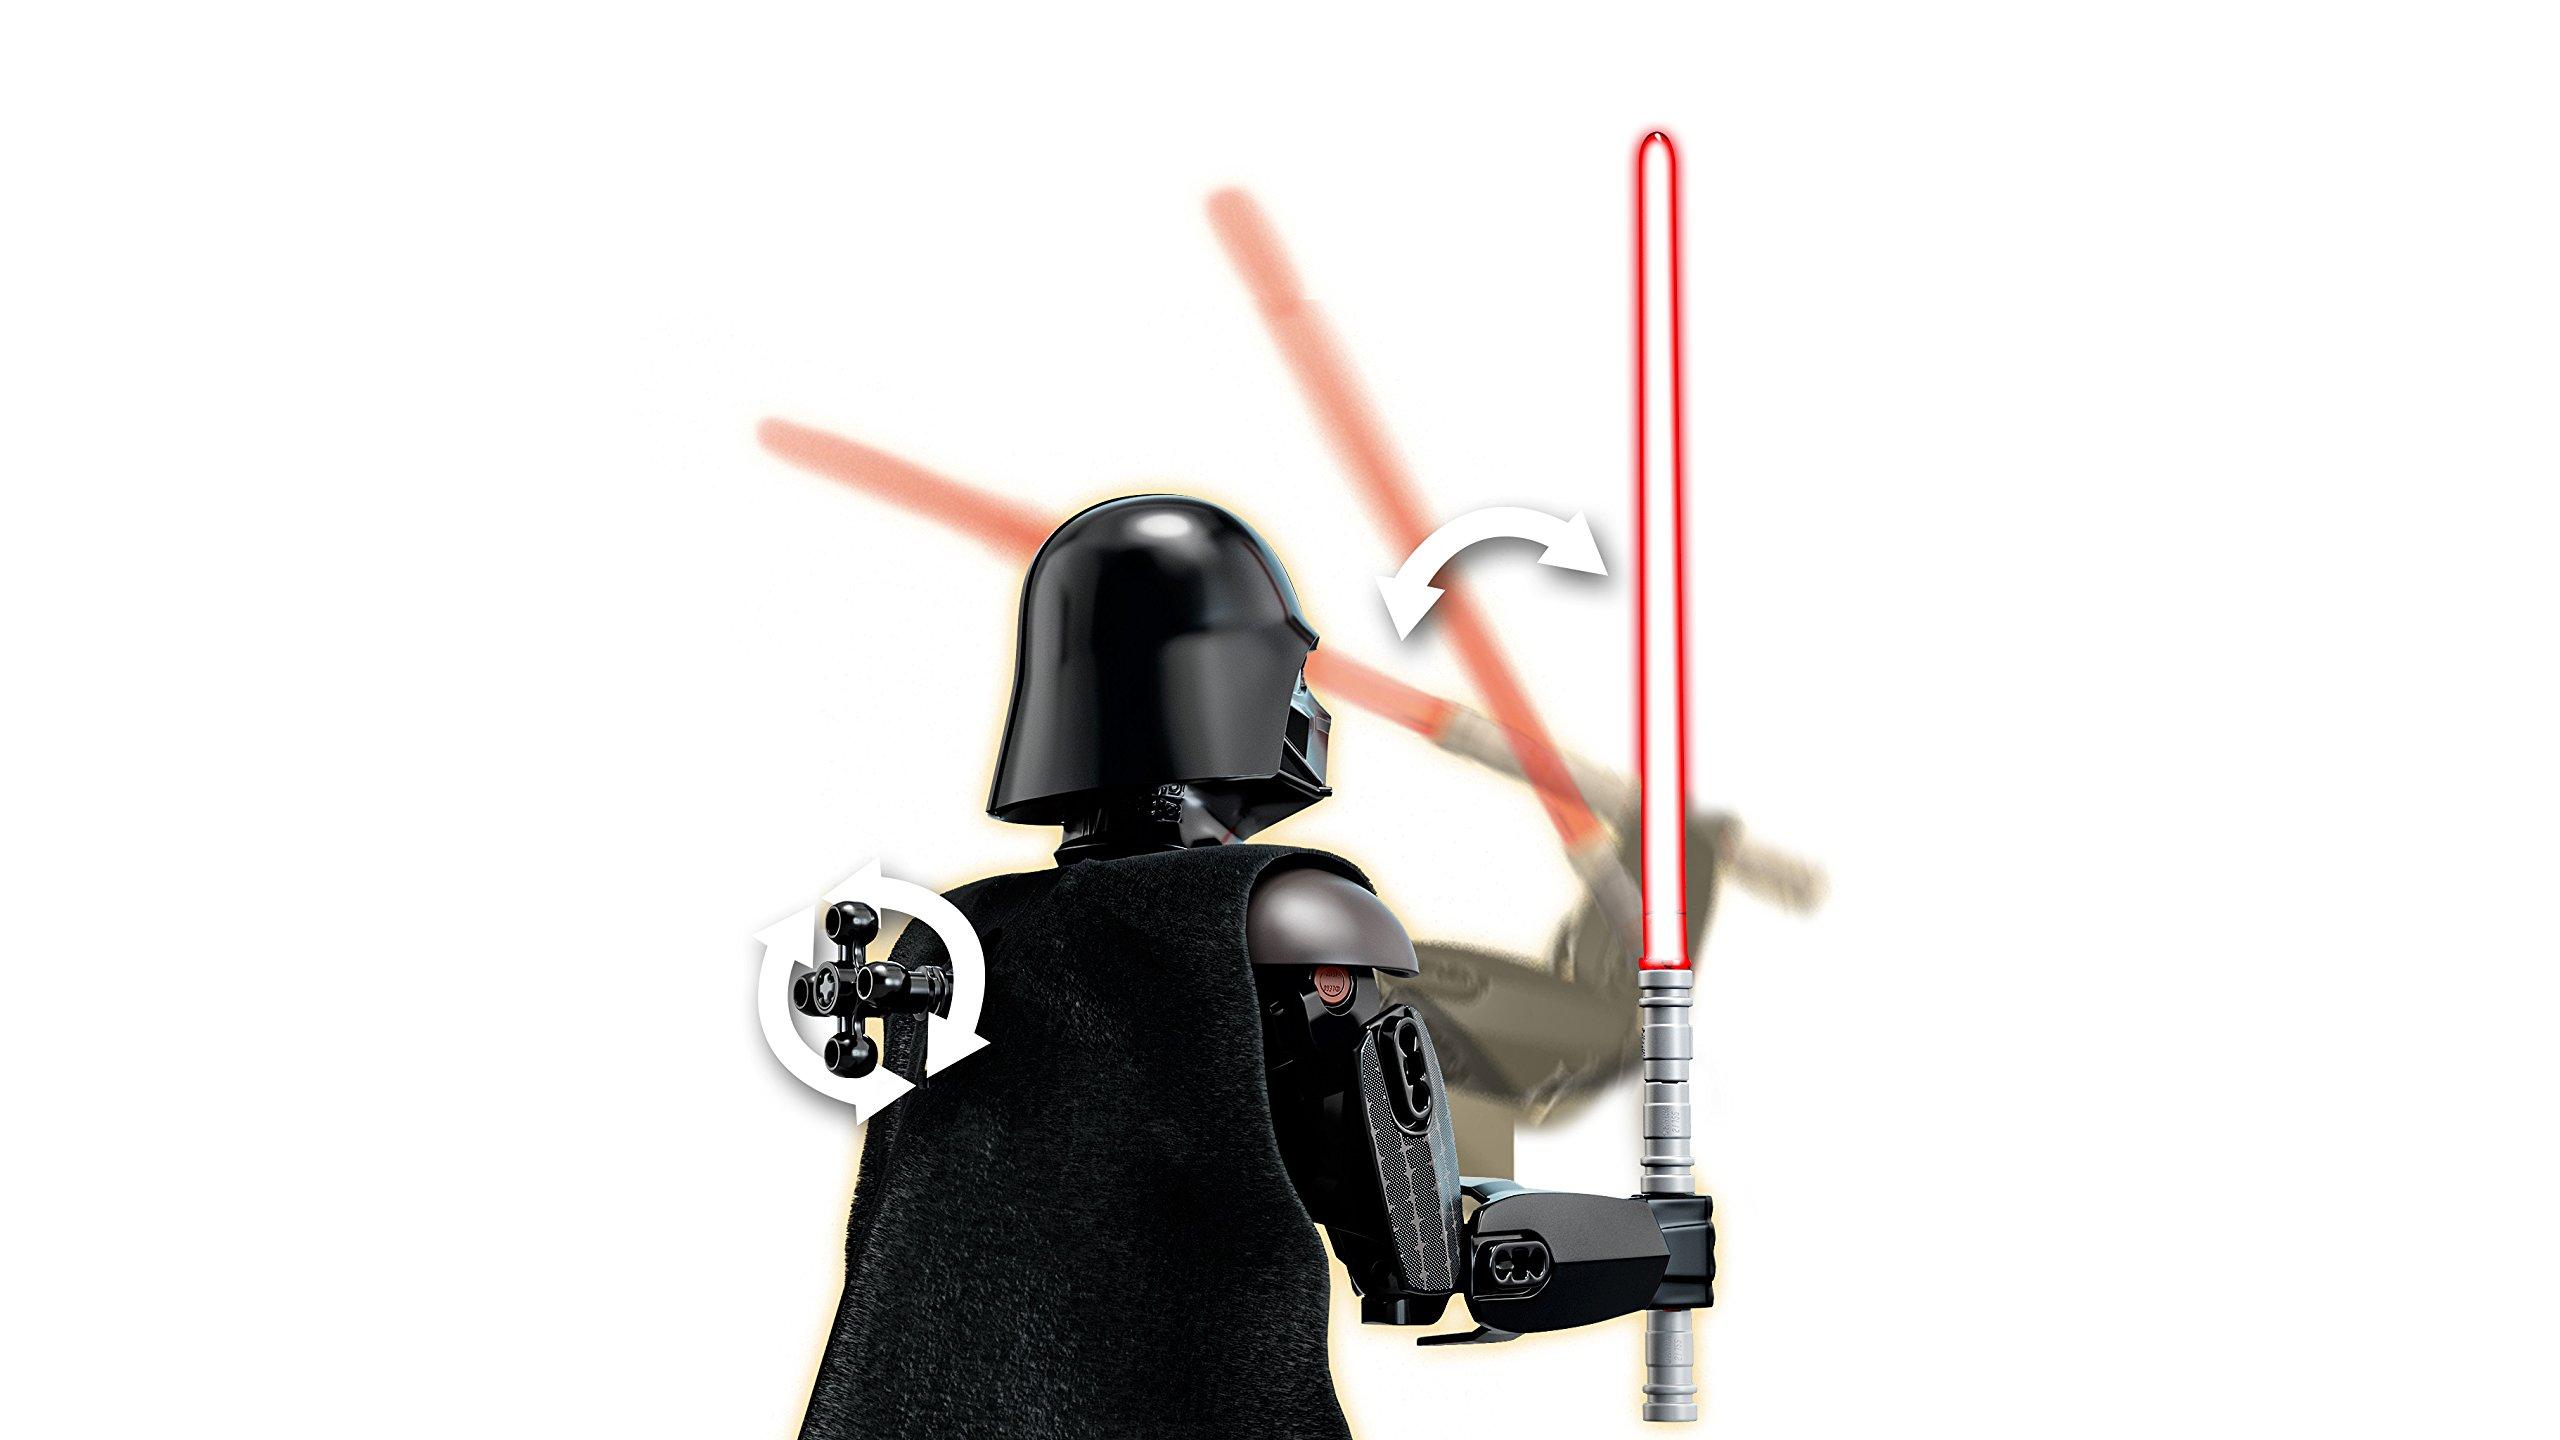 LEGO-Star Wars con structionDarth Vader, Multicolore, 75534 5 spesavip